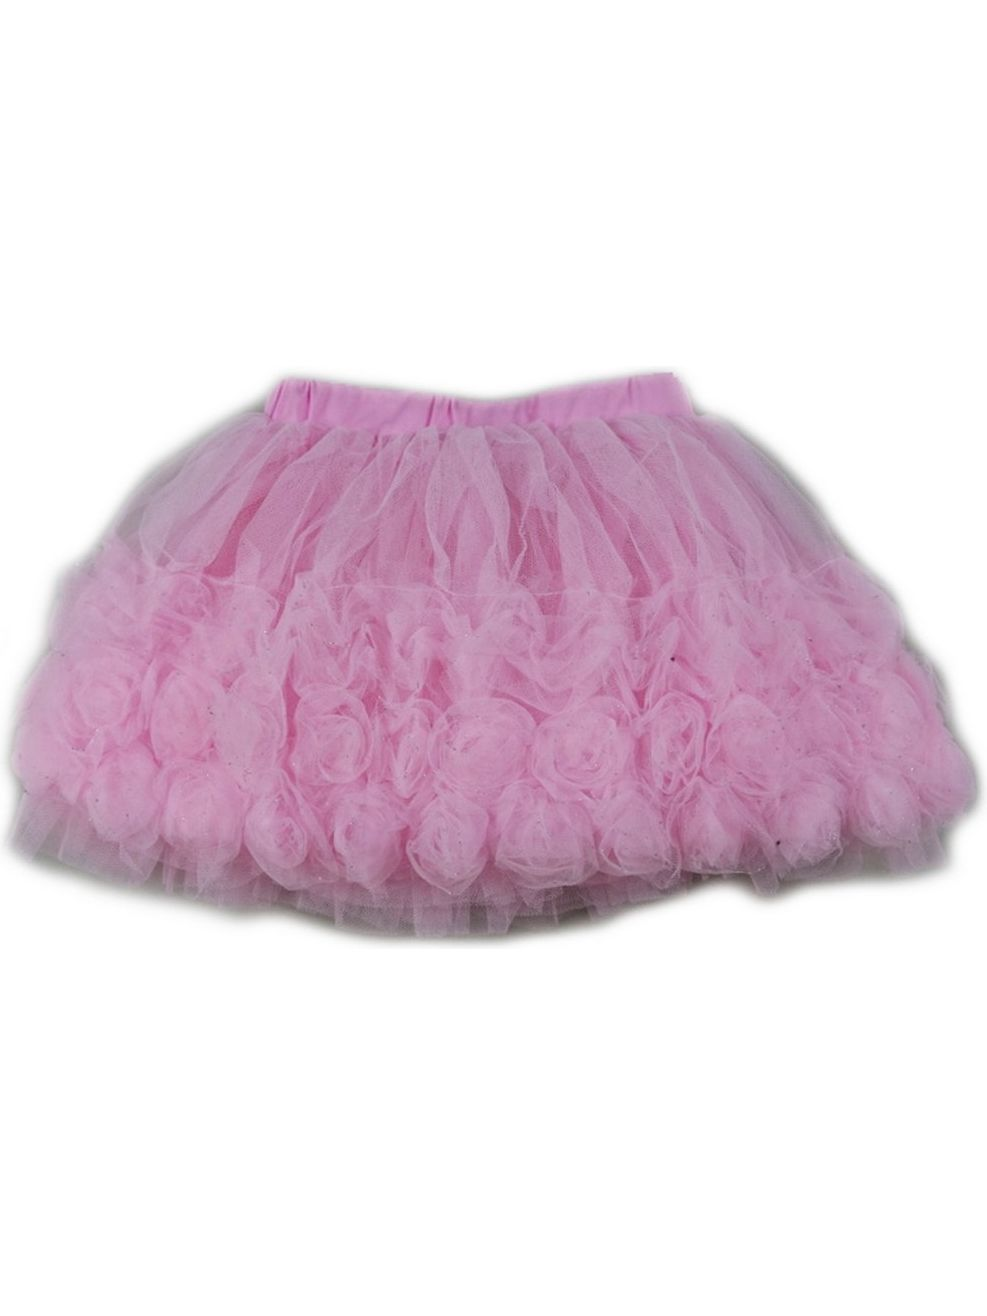 Wenchoice Girls Pink 3-D Rose Trim Embellished Tutu Skirt